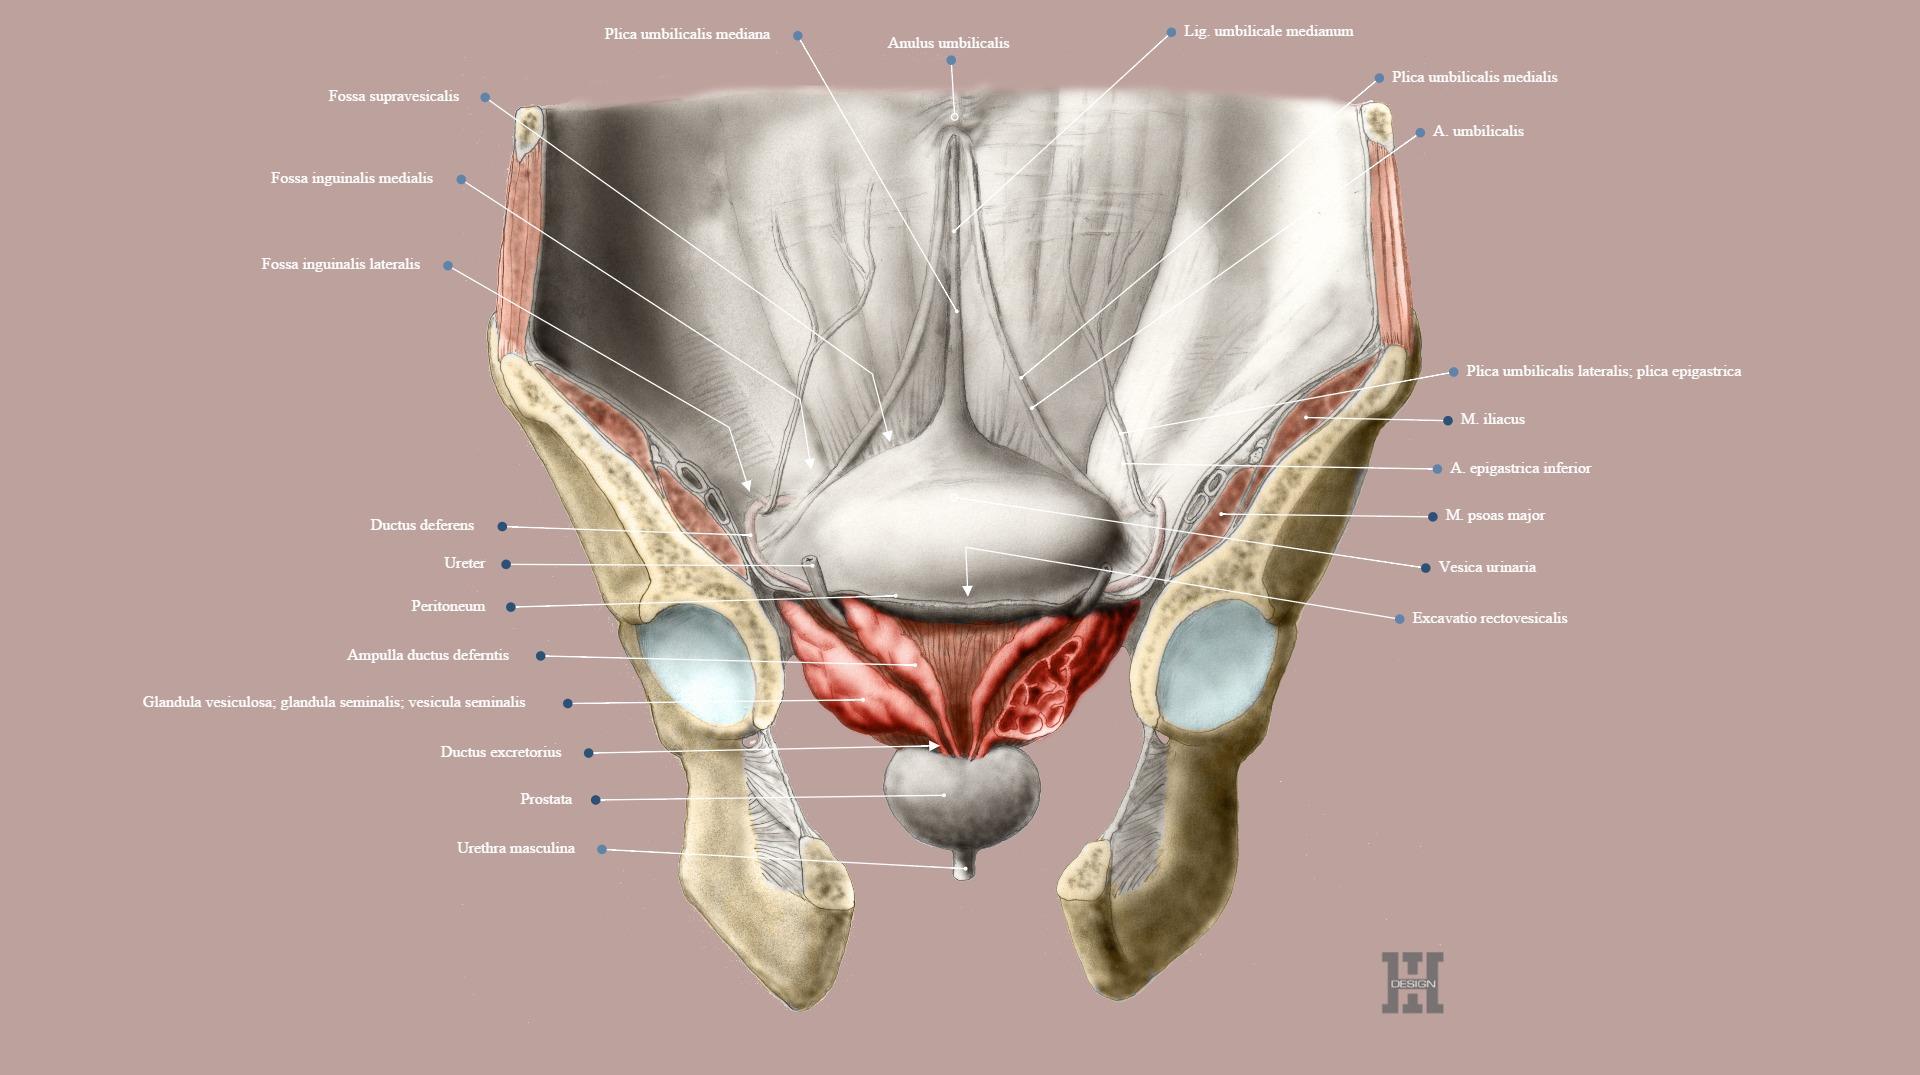 Urinary Bladder And Prostate